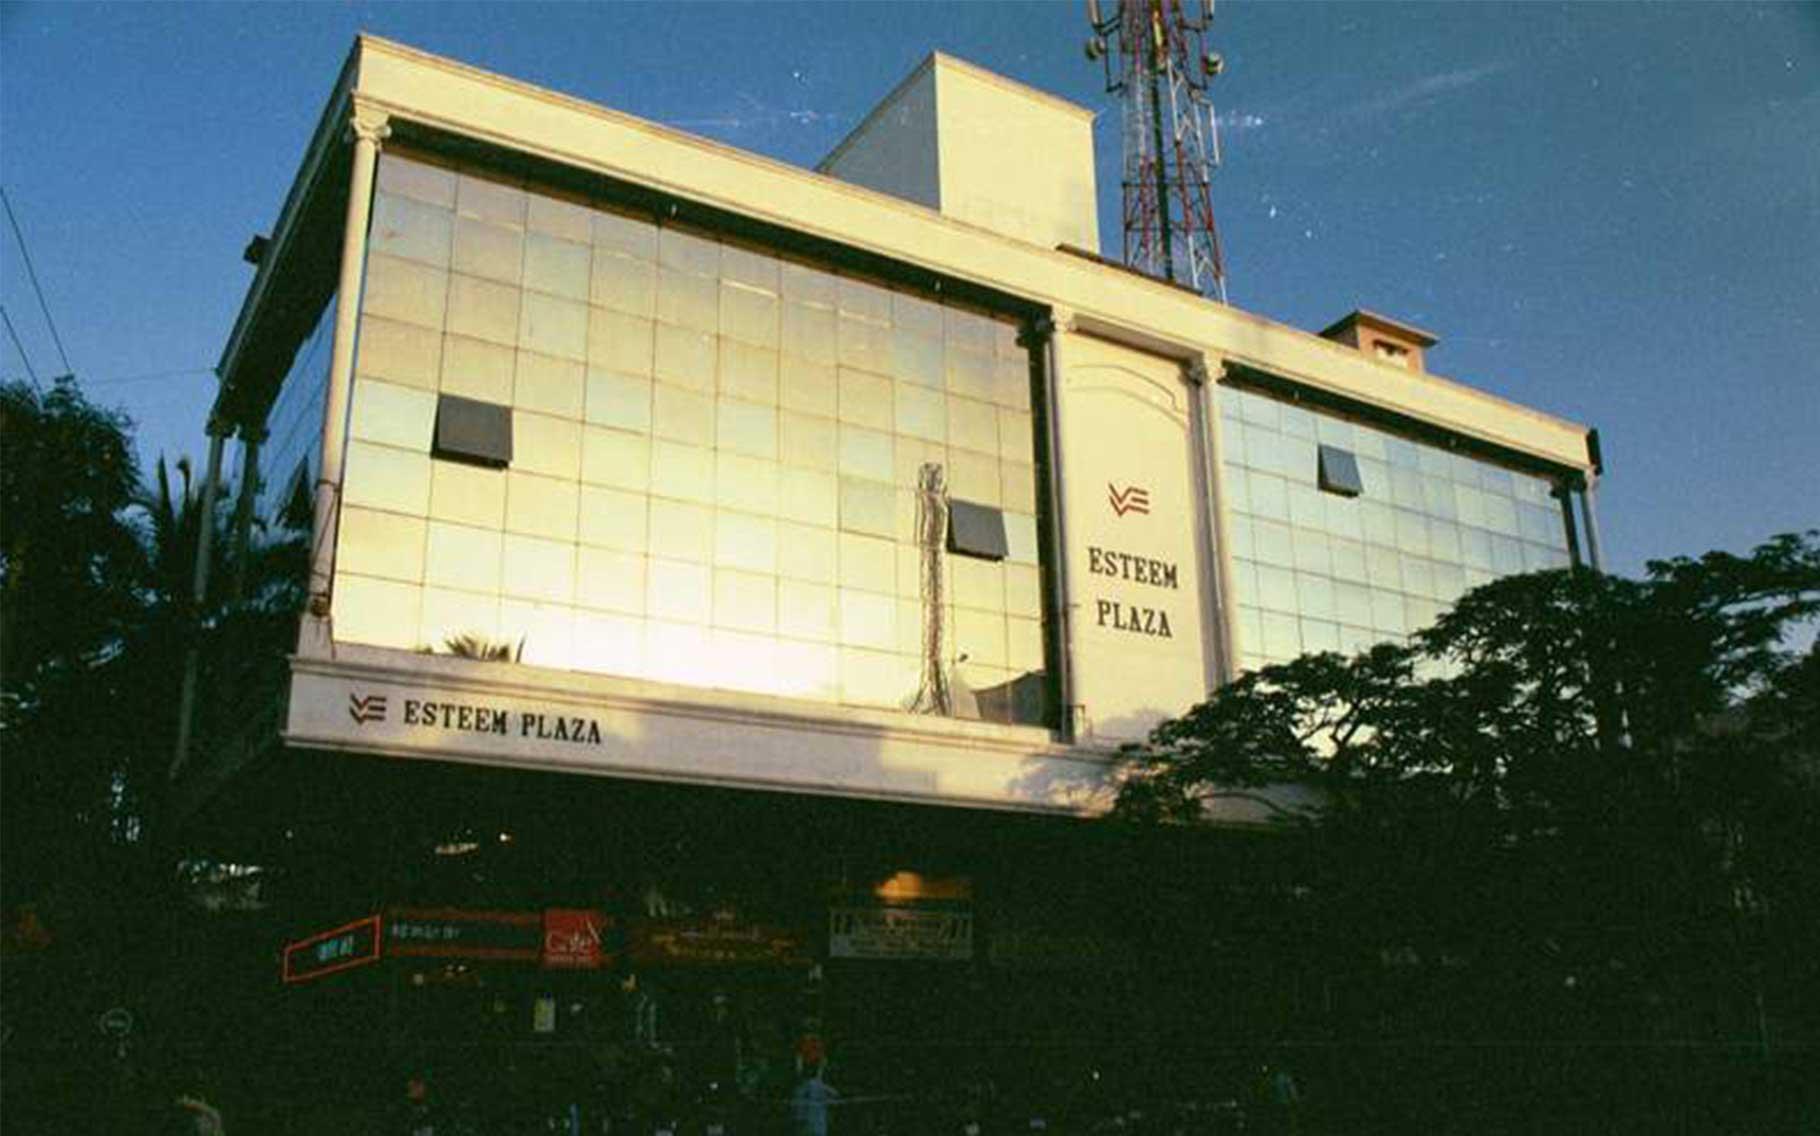 Esteem Plaza